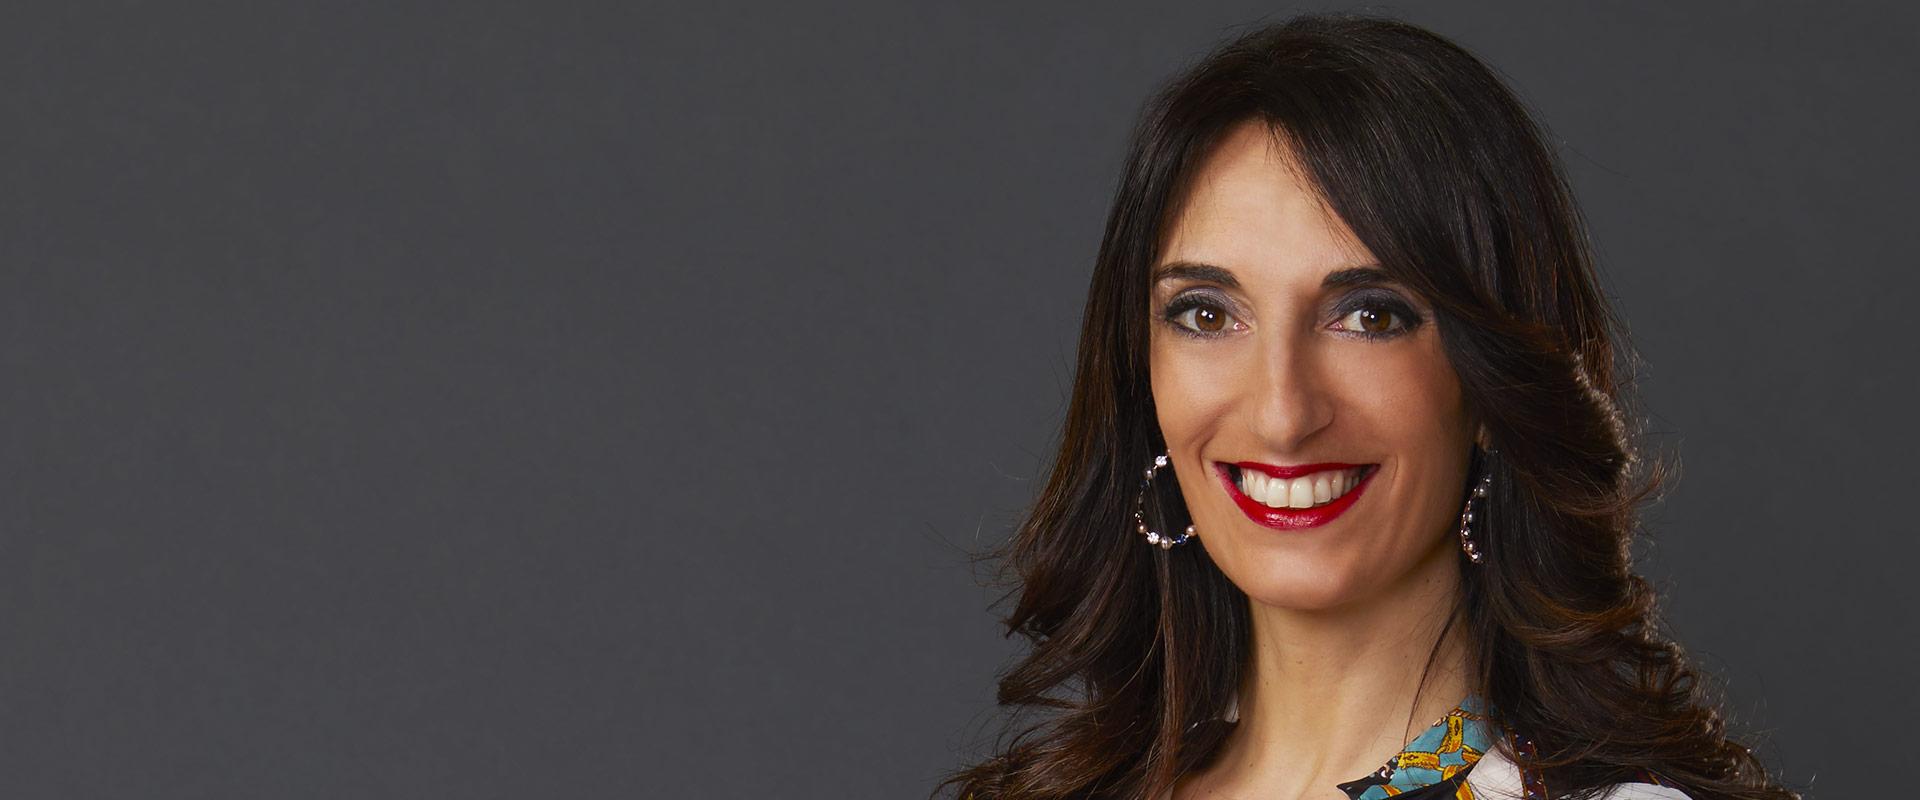 Equilybra - dott.ssa Giorgia Garofano